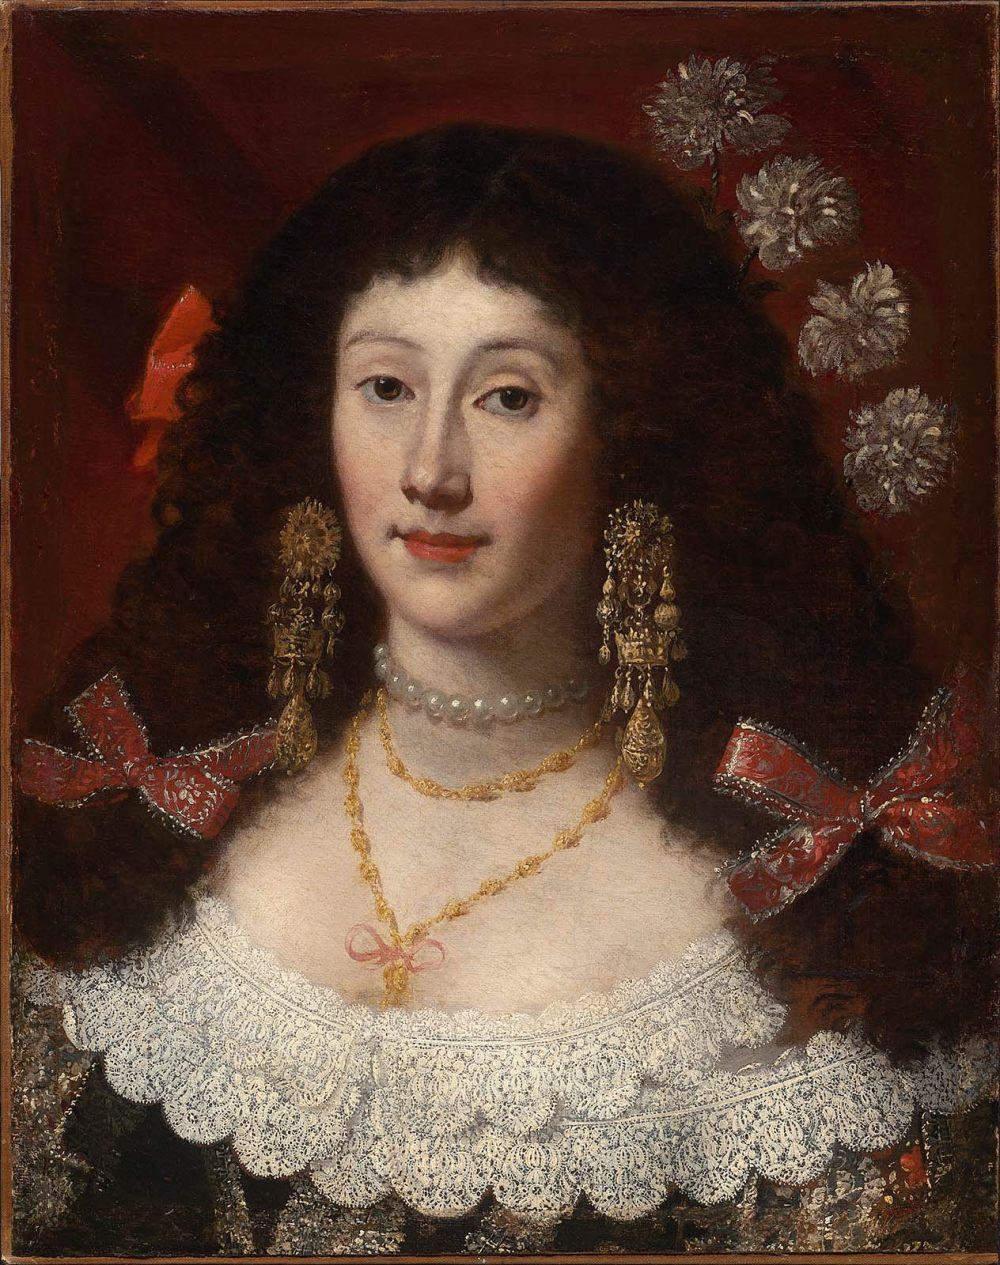 Juan Carreño de Miranda. Retrato de mujer. 1650.-1670. Museum of Fine Arts. Boston.